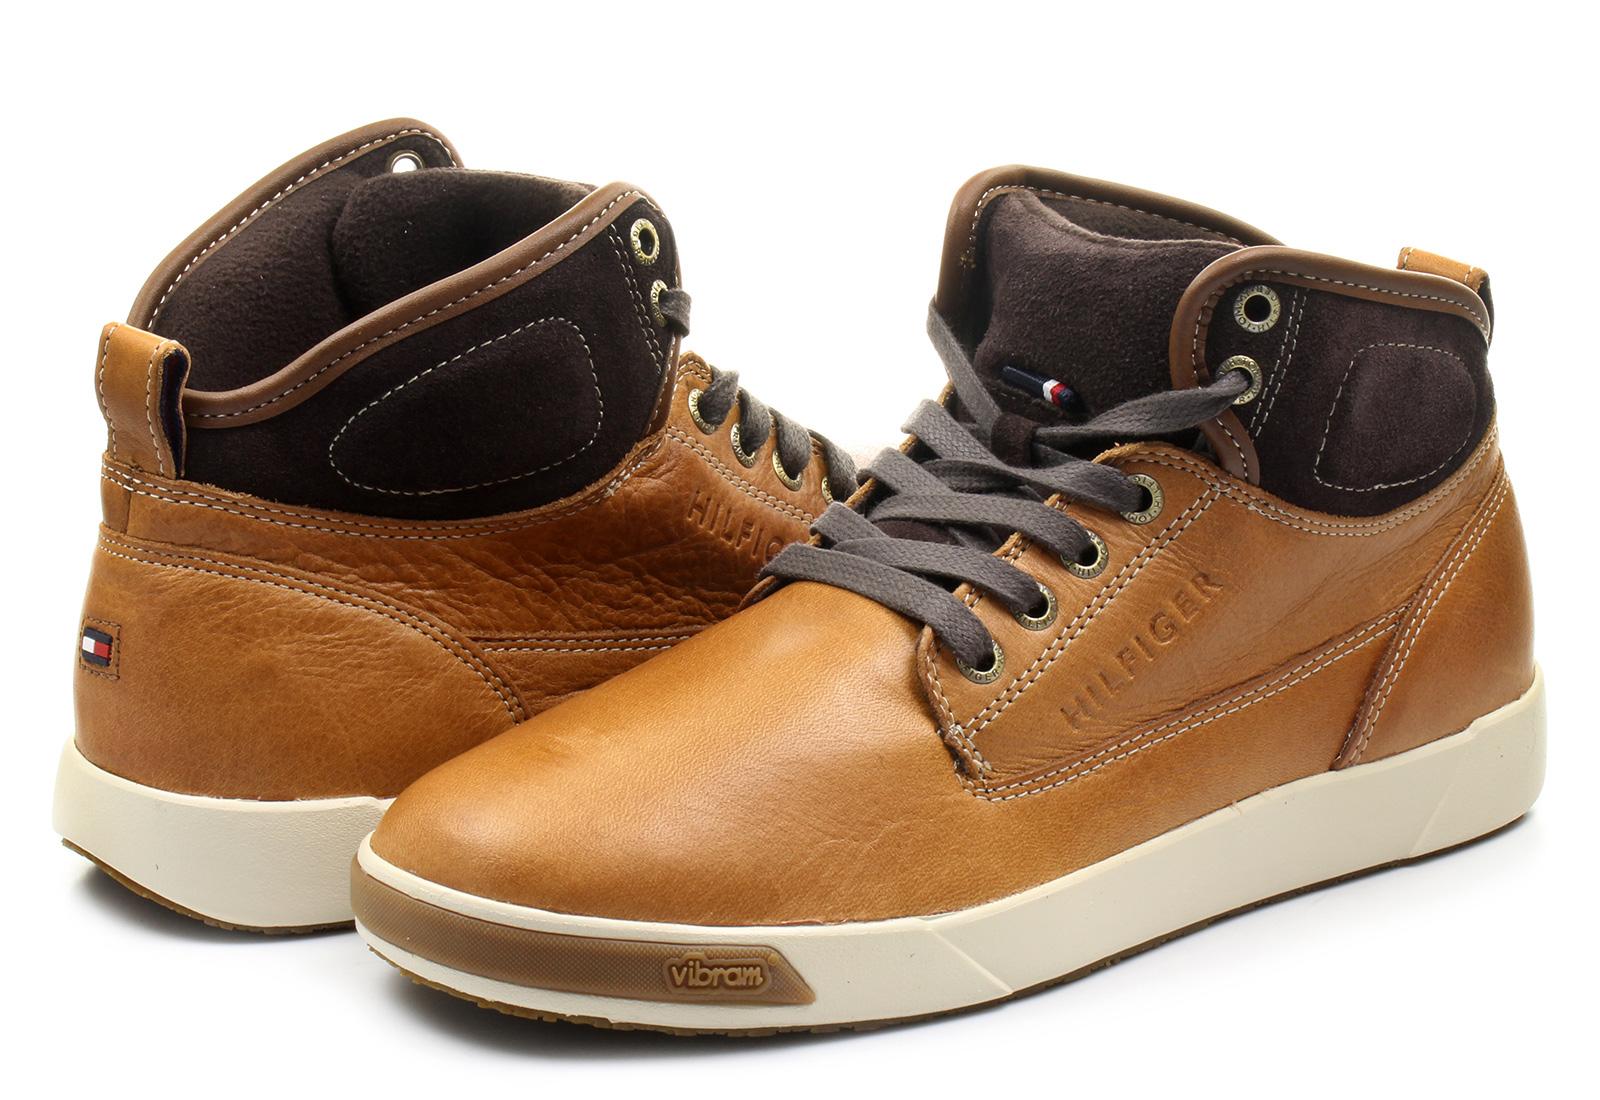 tommy hilfiger shoes - maverek 3cv - 15f-9825-906